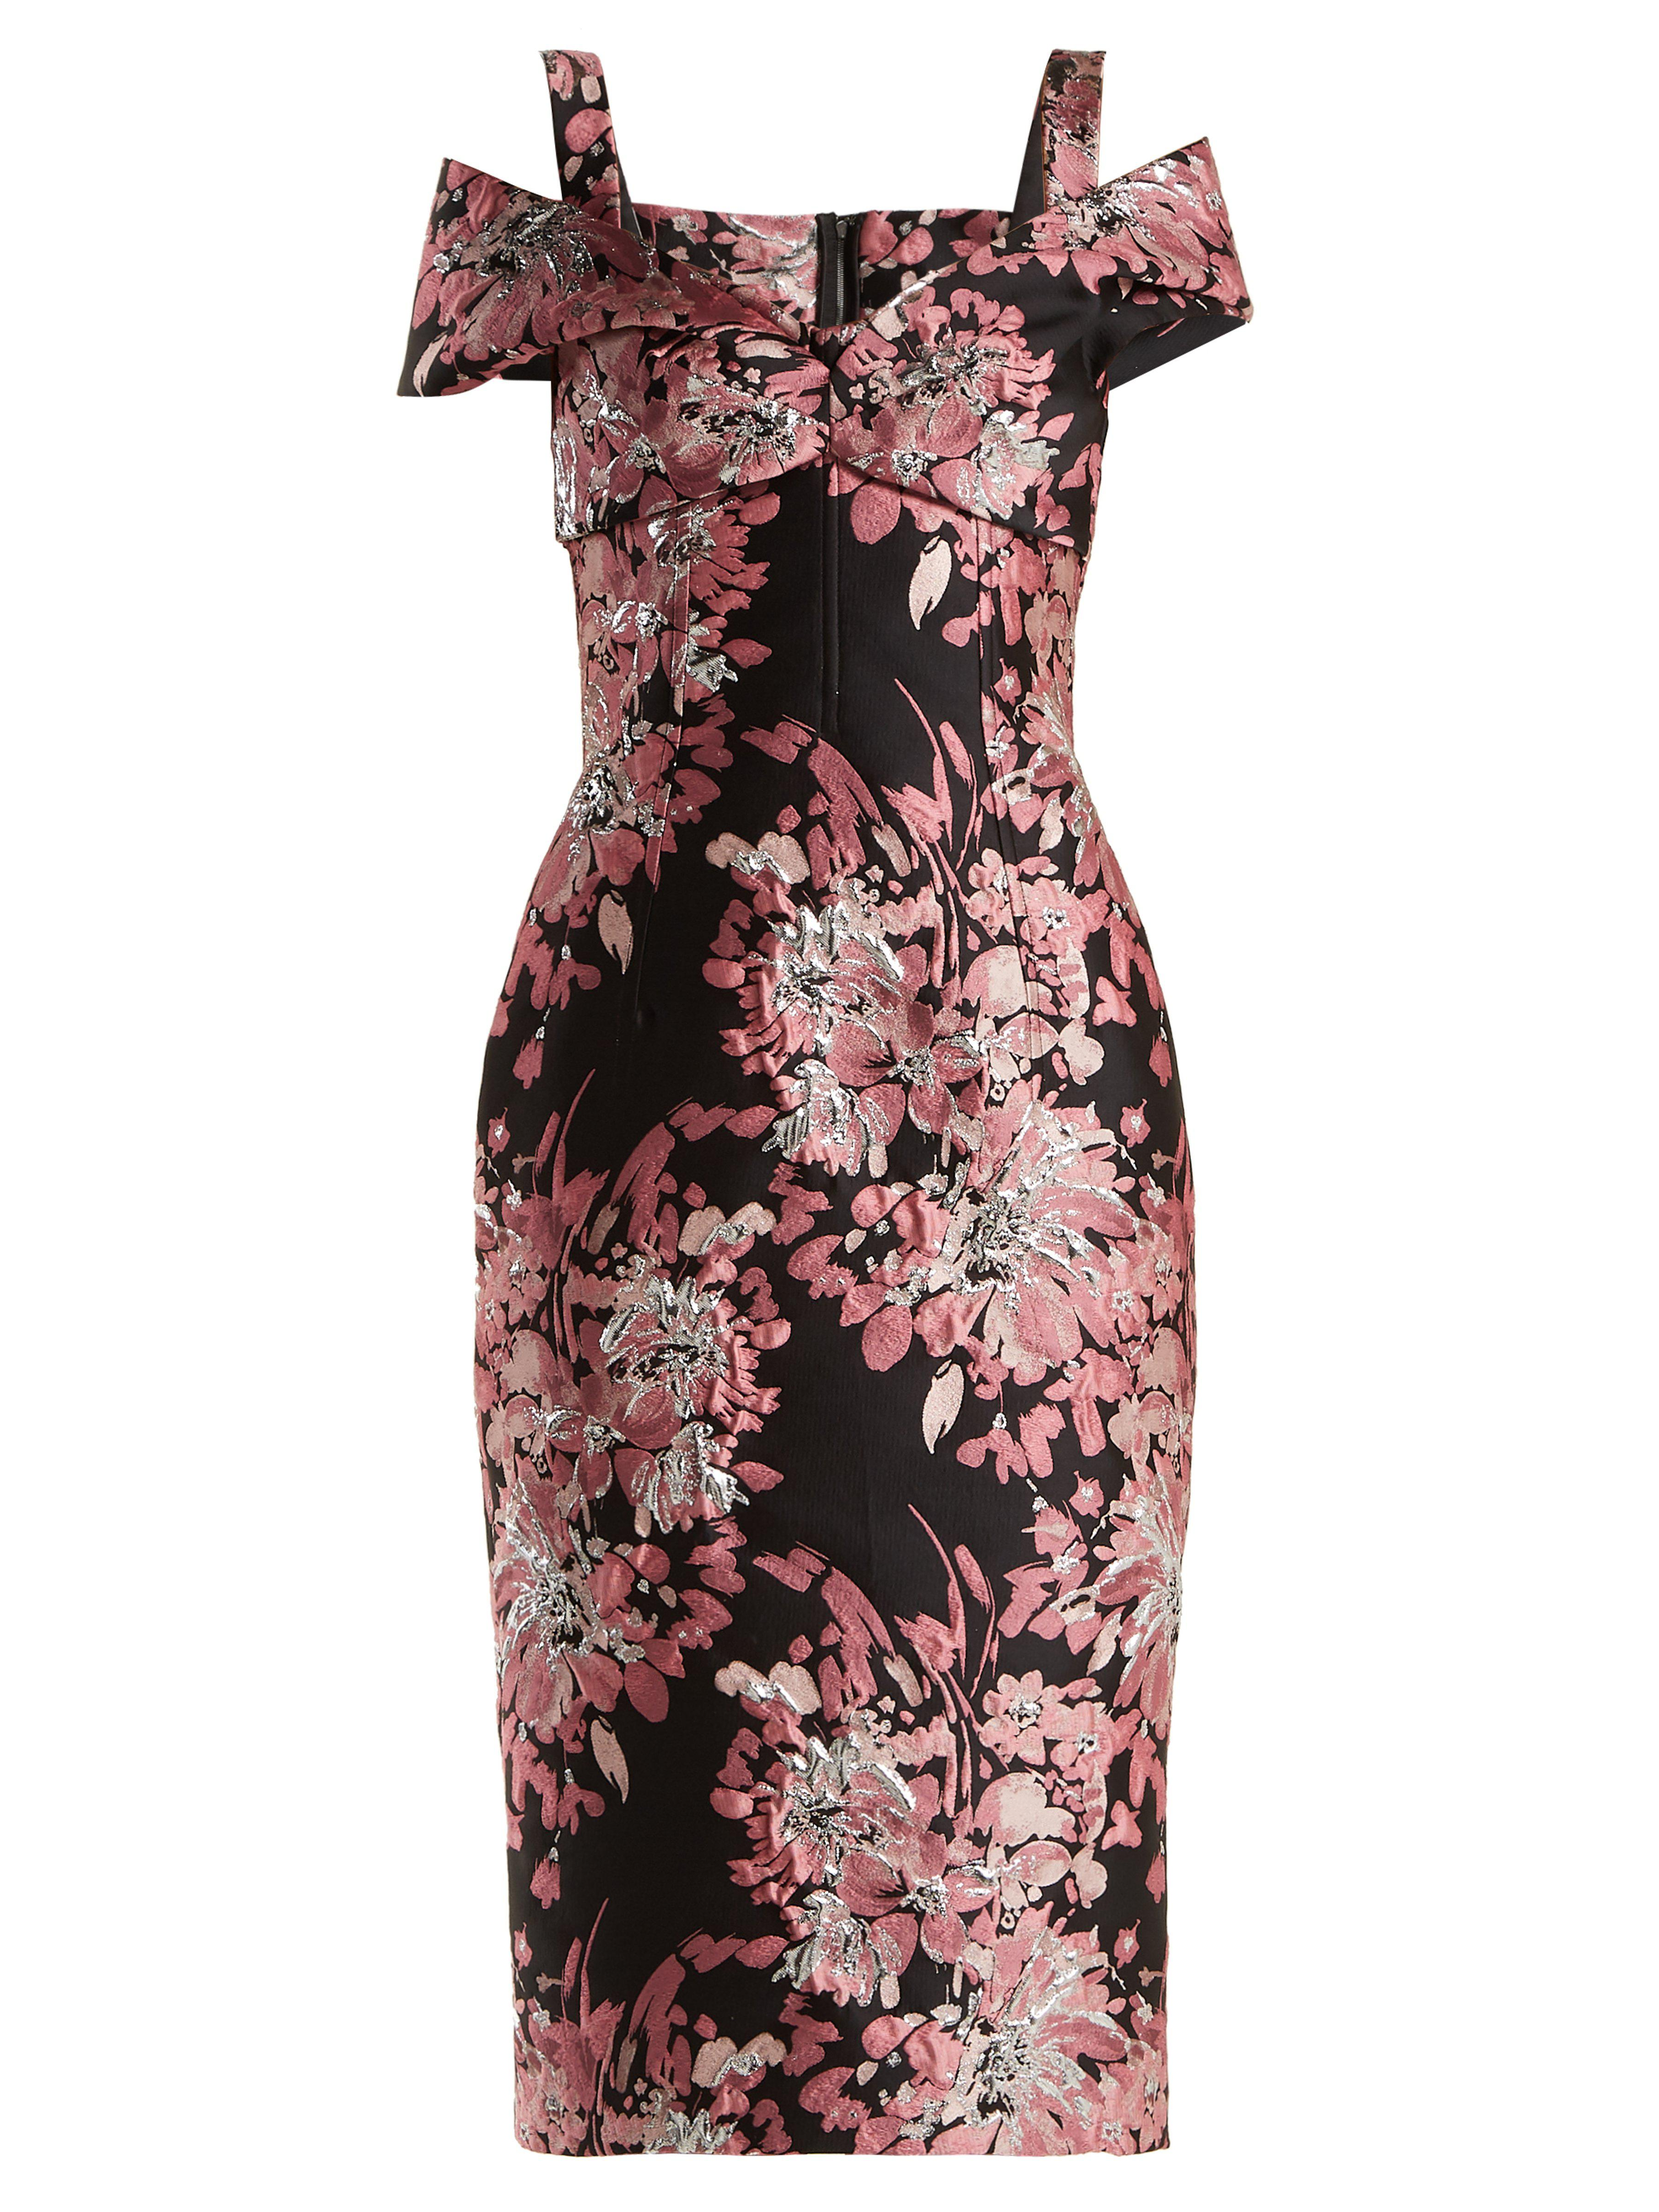 6c0e3706 Dolce & Gabbana Floral Jacquard Dress in Black - Lyst